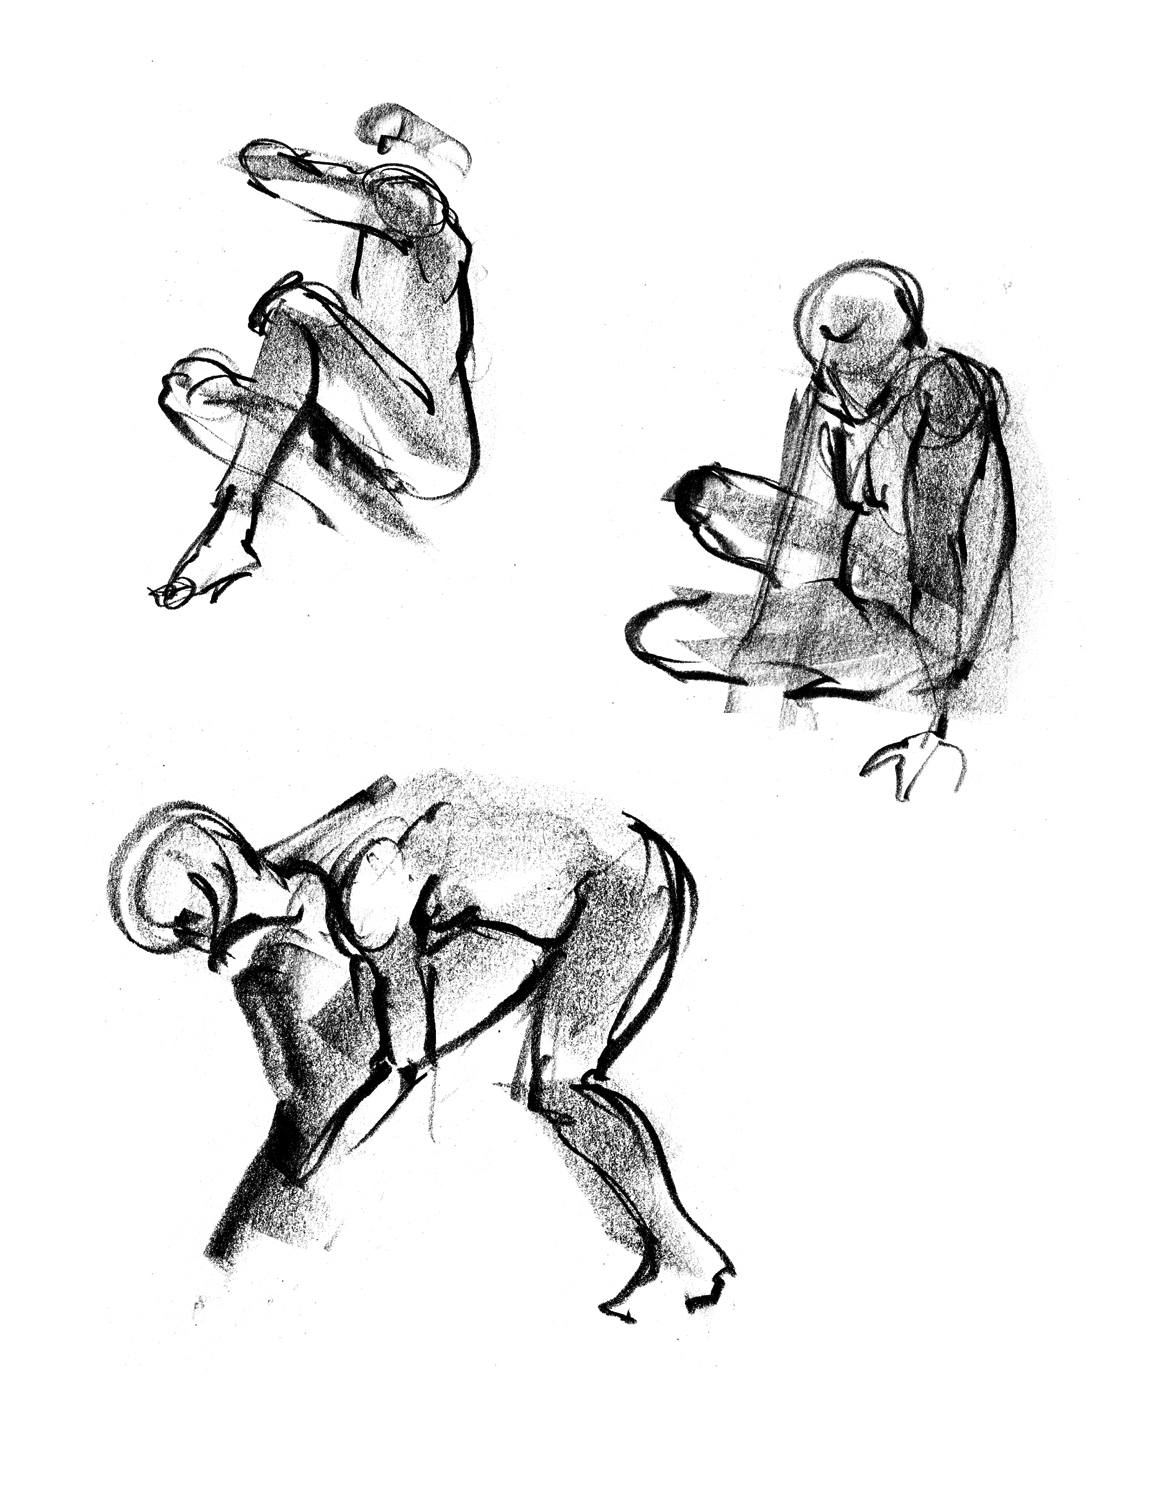 alblogo: Figure